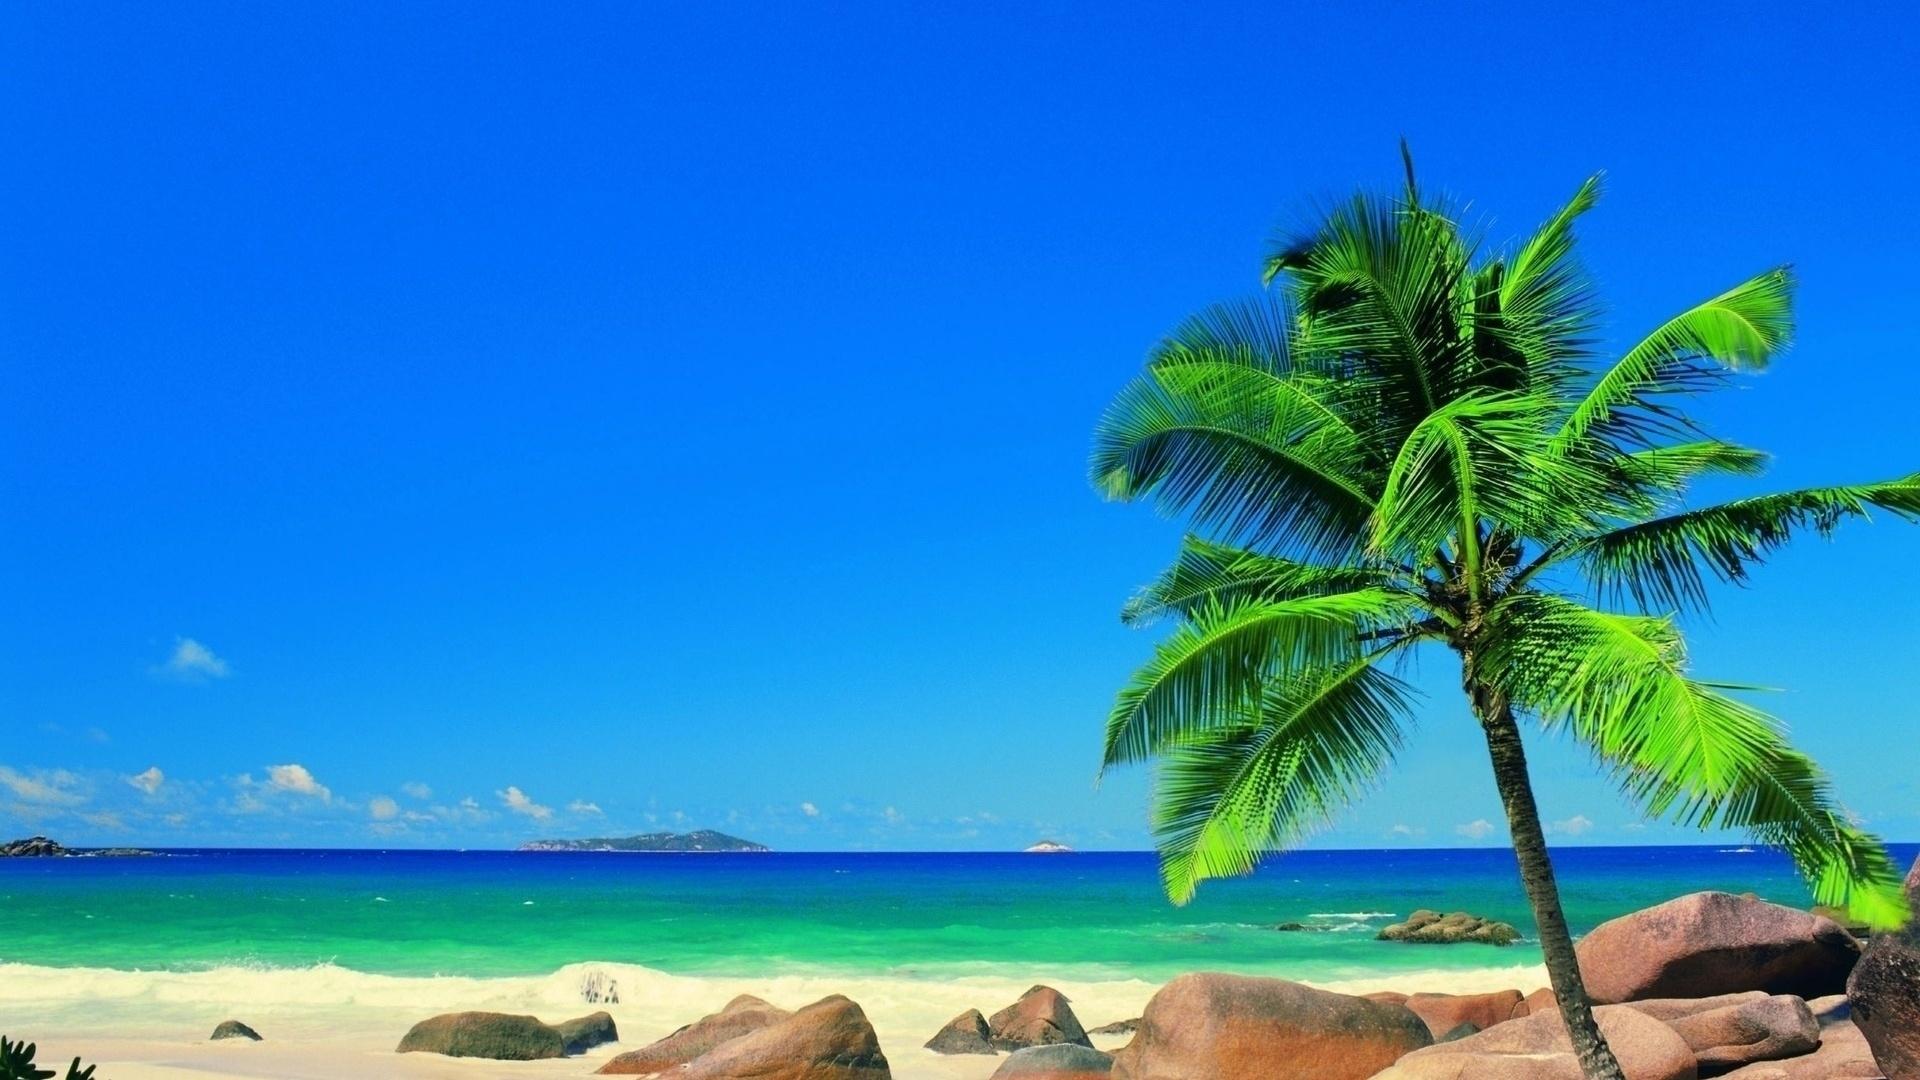 Paradise Background Wallpaper